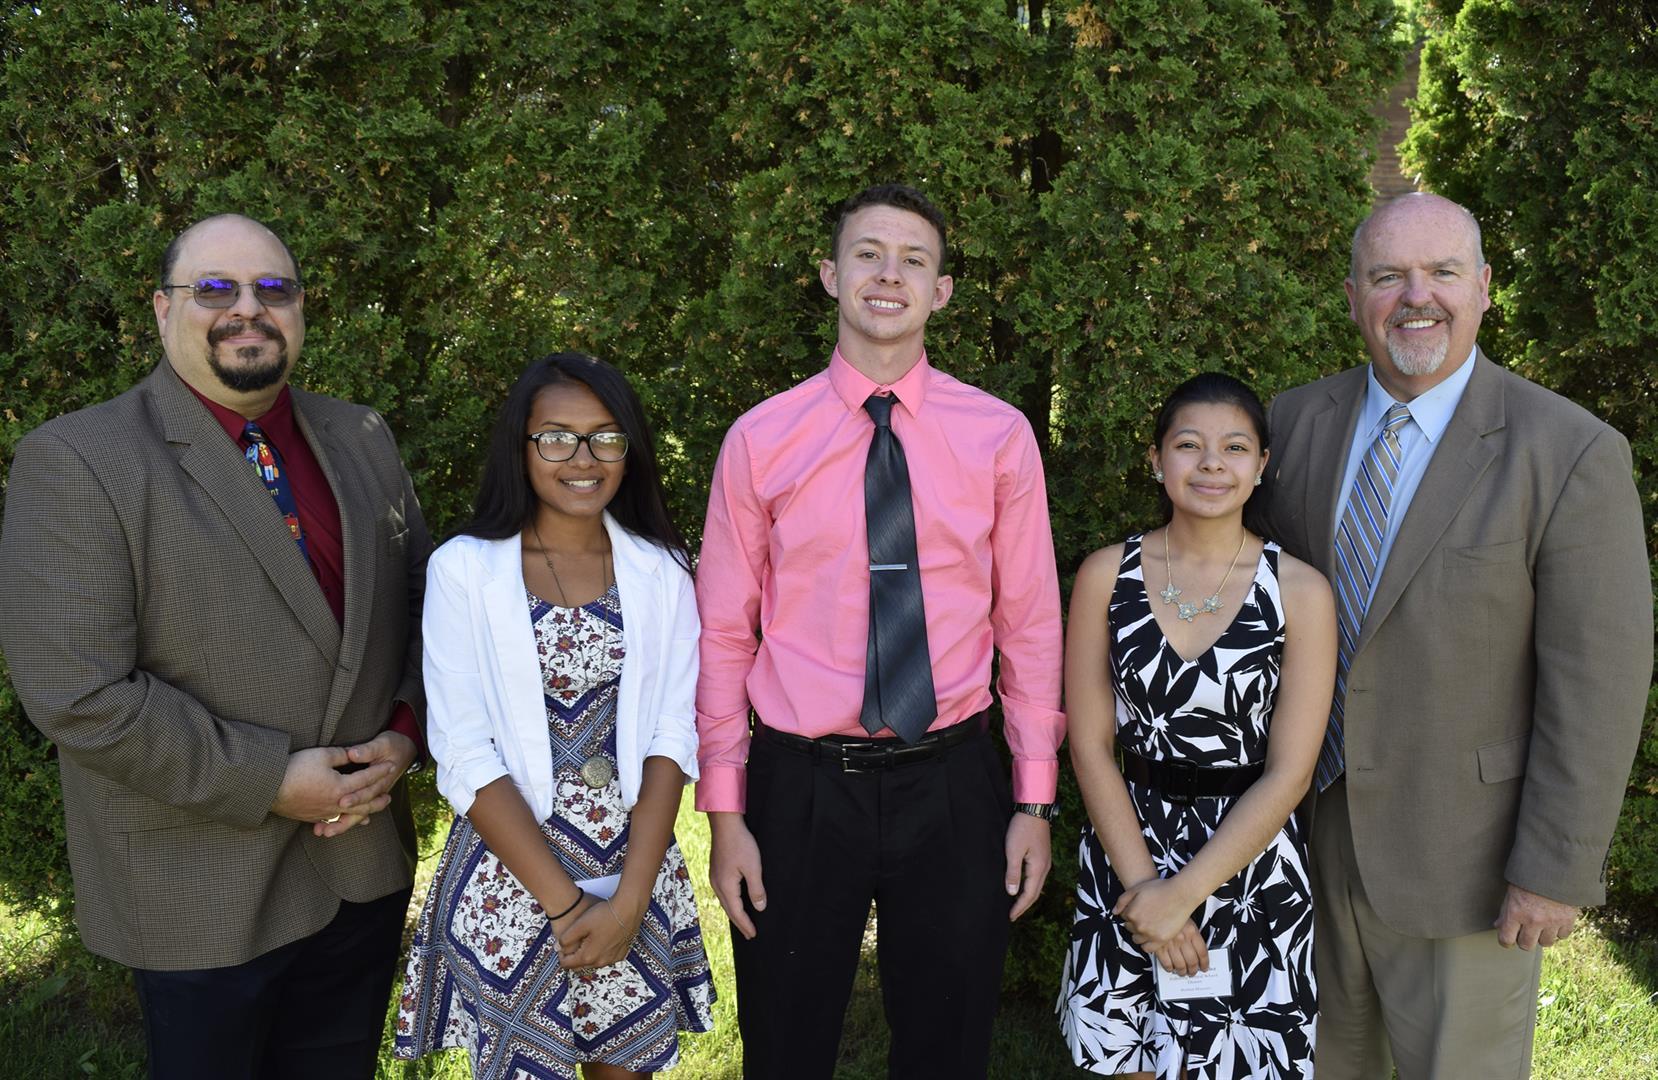 Fallsburg Seniors Receive Award